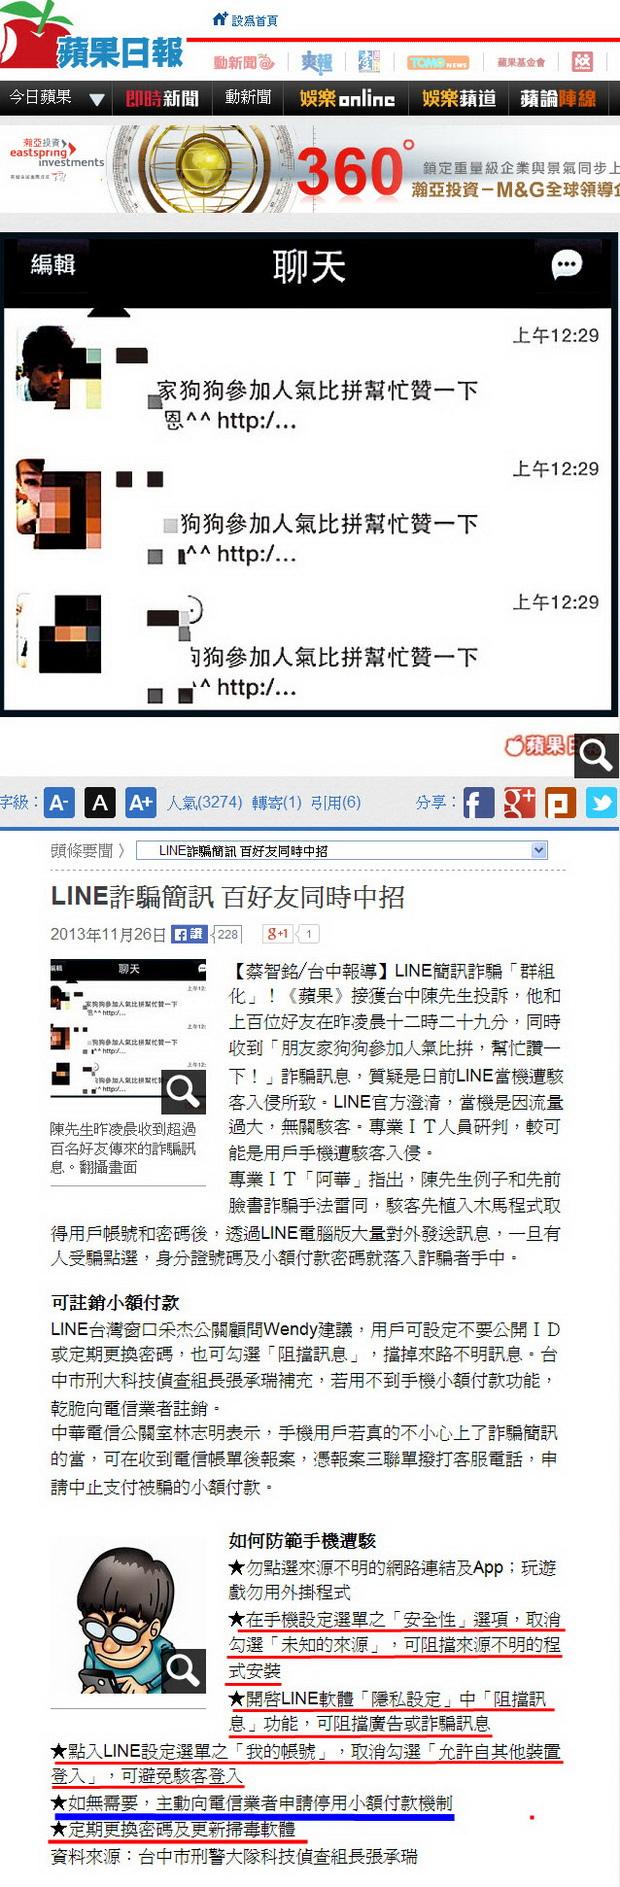 LINE詐騙簡訊 百好友同時中招-2013.11.26.jpg